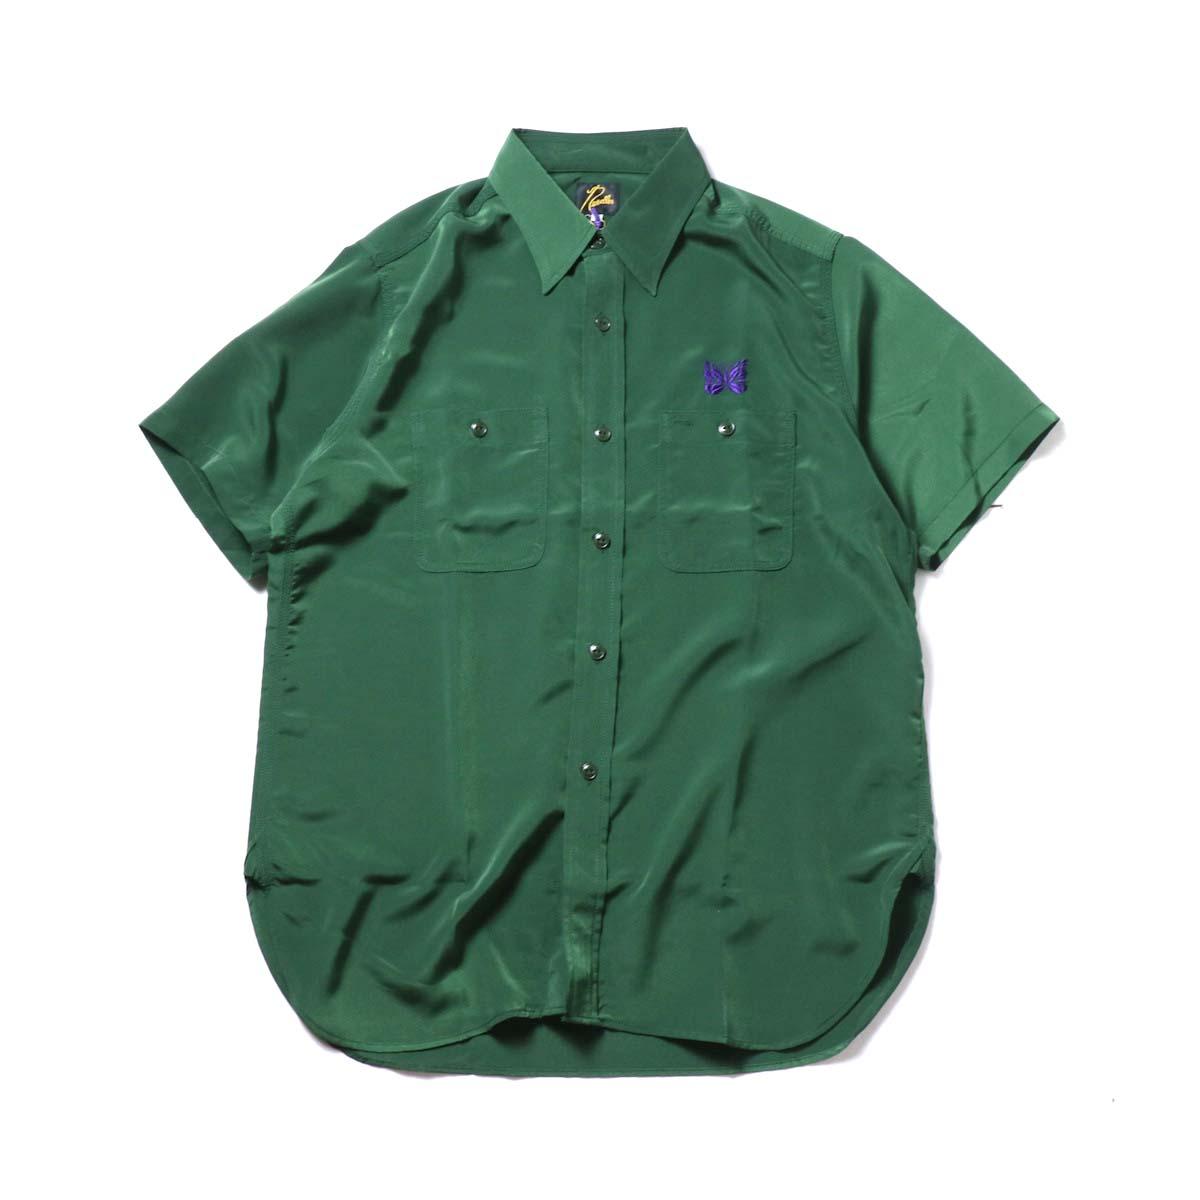 Needles / S/S Work Shirt - Poly Cloth (Green)